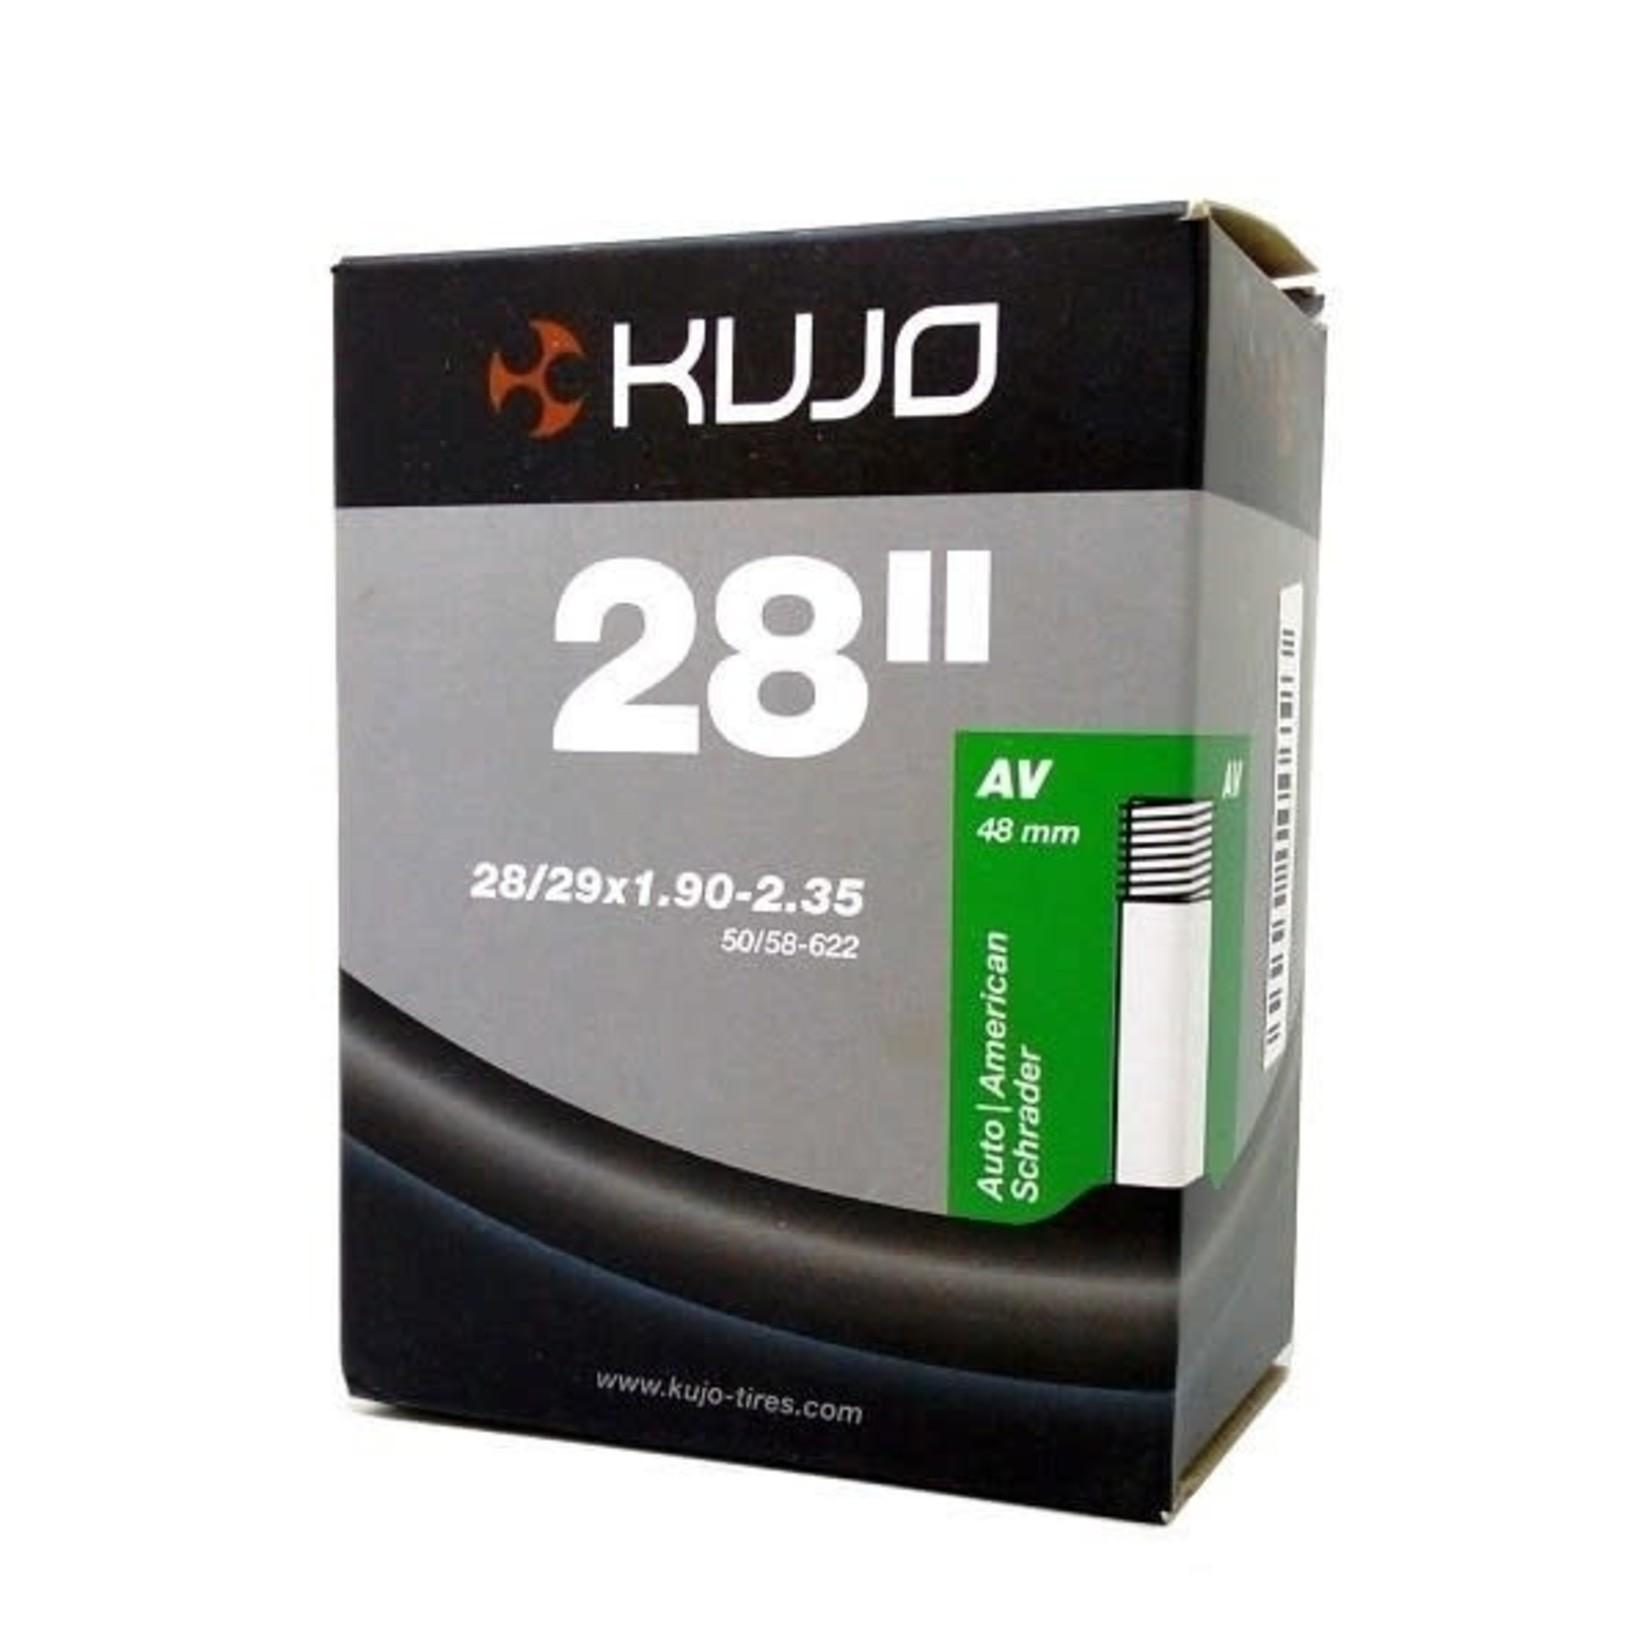 KUJO 28/29 x 1.90-2.35 Thick Valve Tube